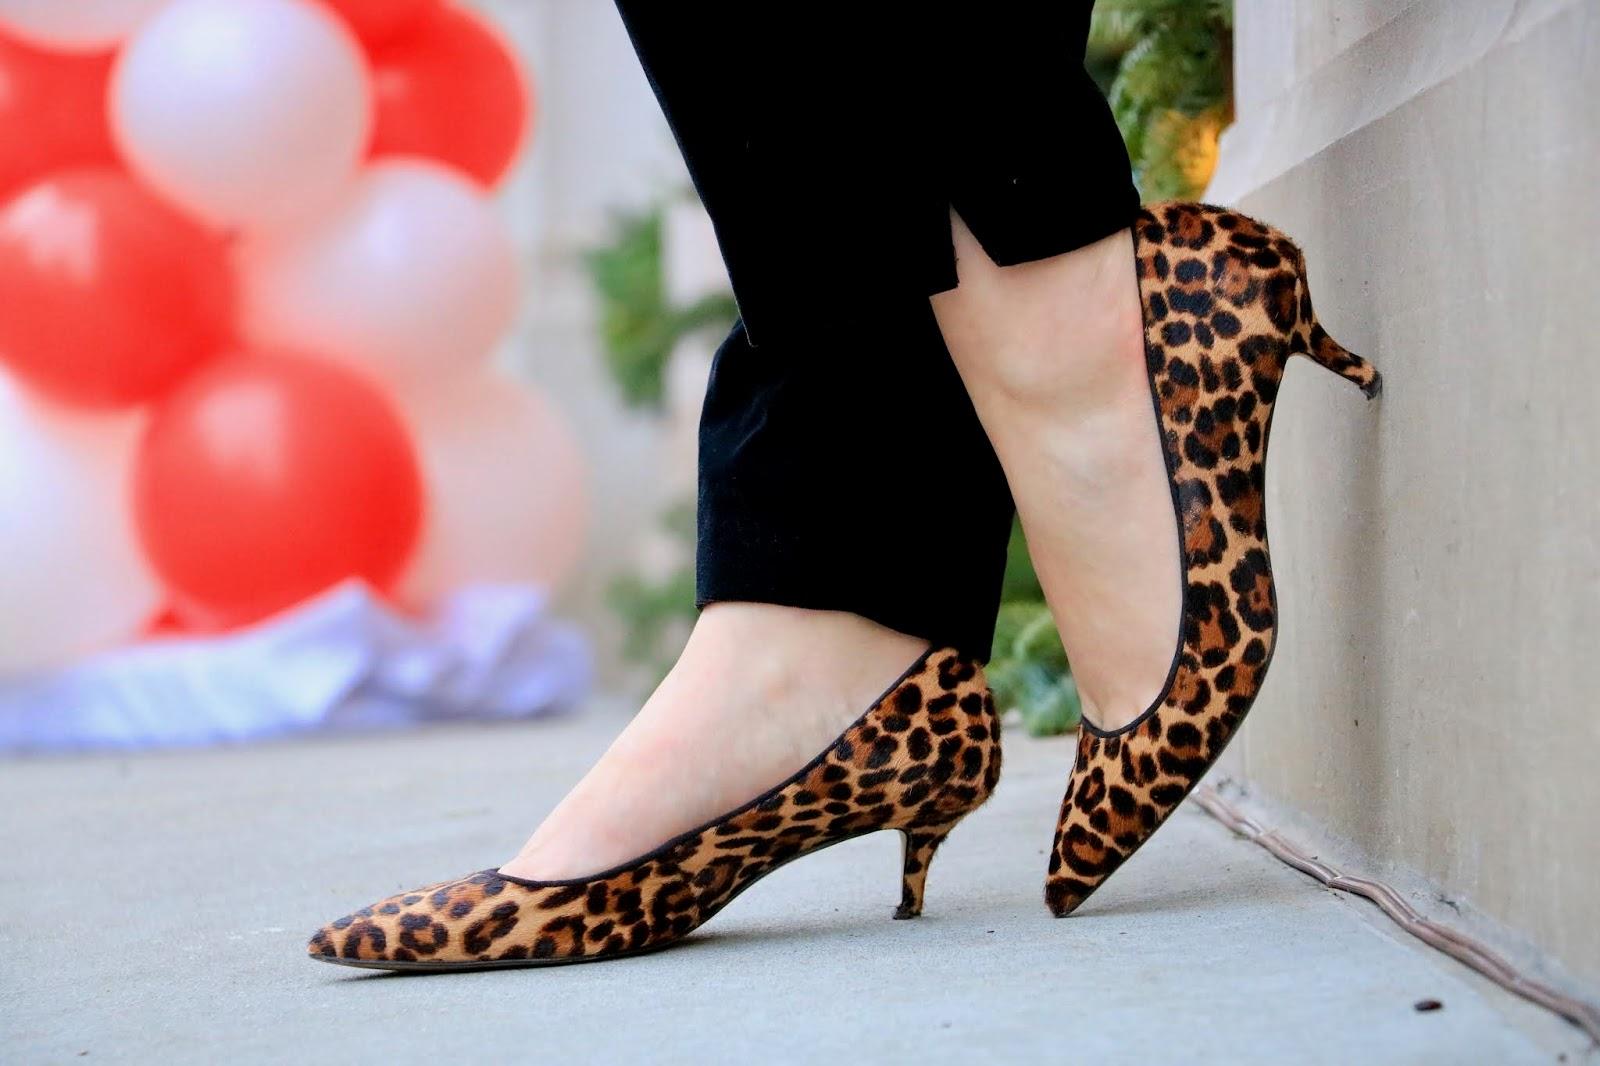 Nyc fashion blogger Kathleen Harper wearing Ann Taylor leopard heels